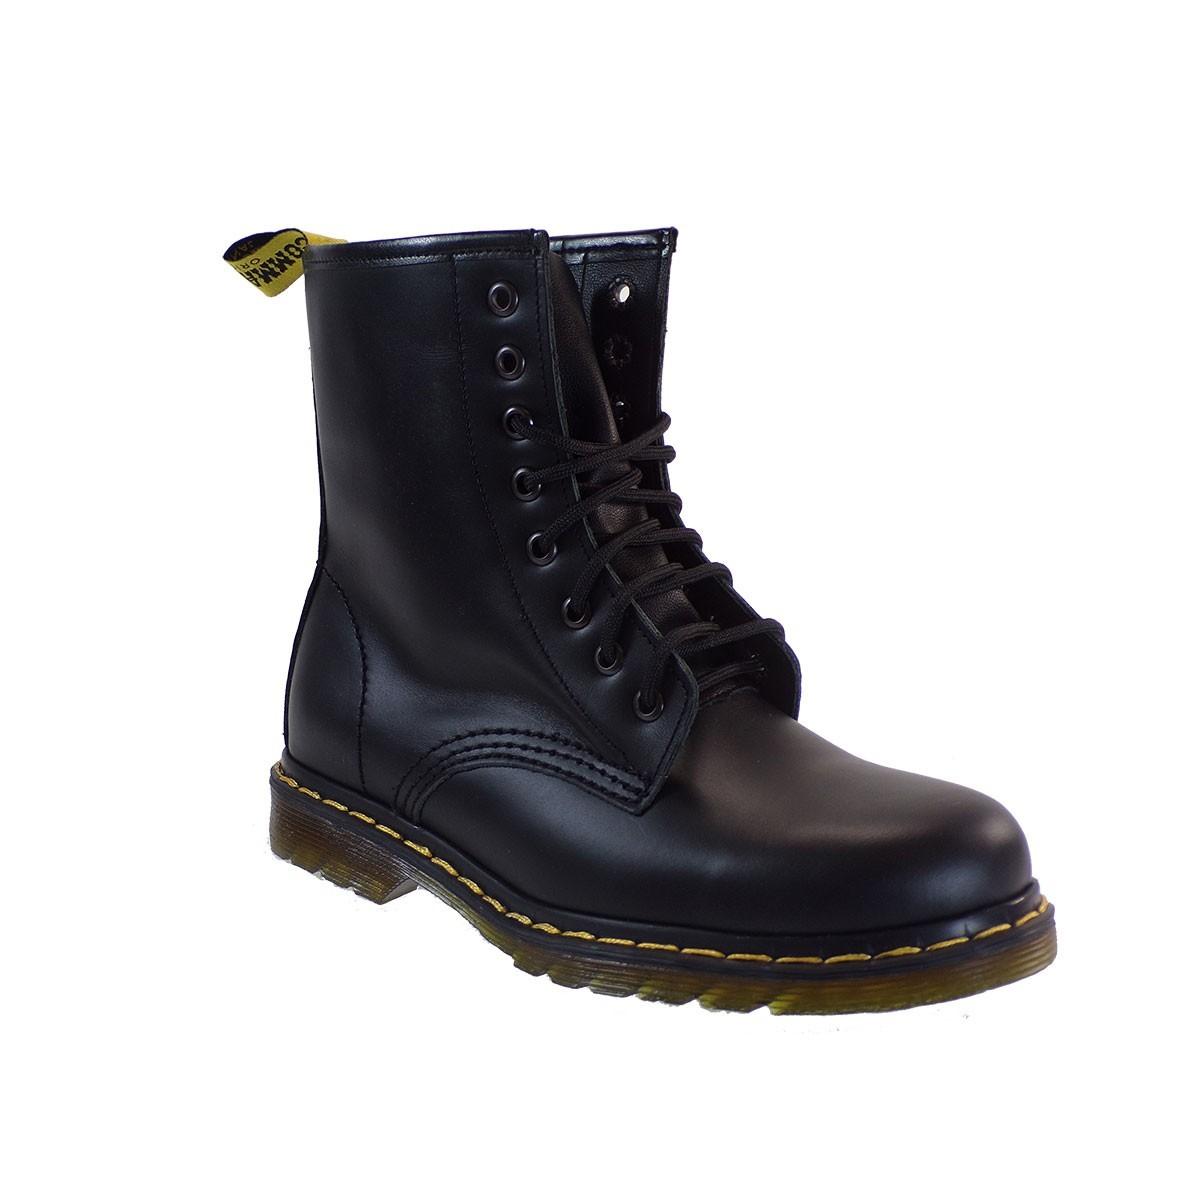 Commanchero Γυναικεία Παπούτσια Μποτάκια Αρβυλάκια 515-921 Μαύρο Δέρμα